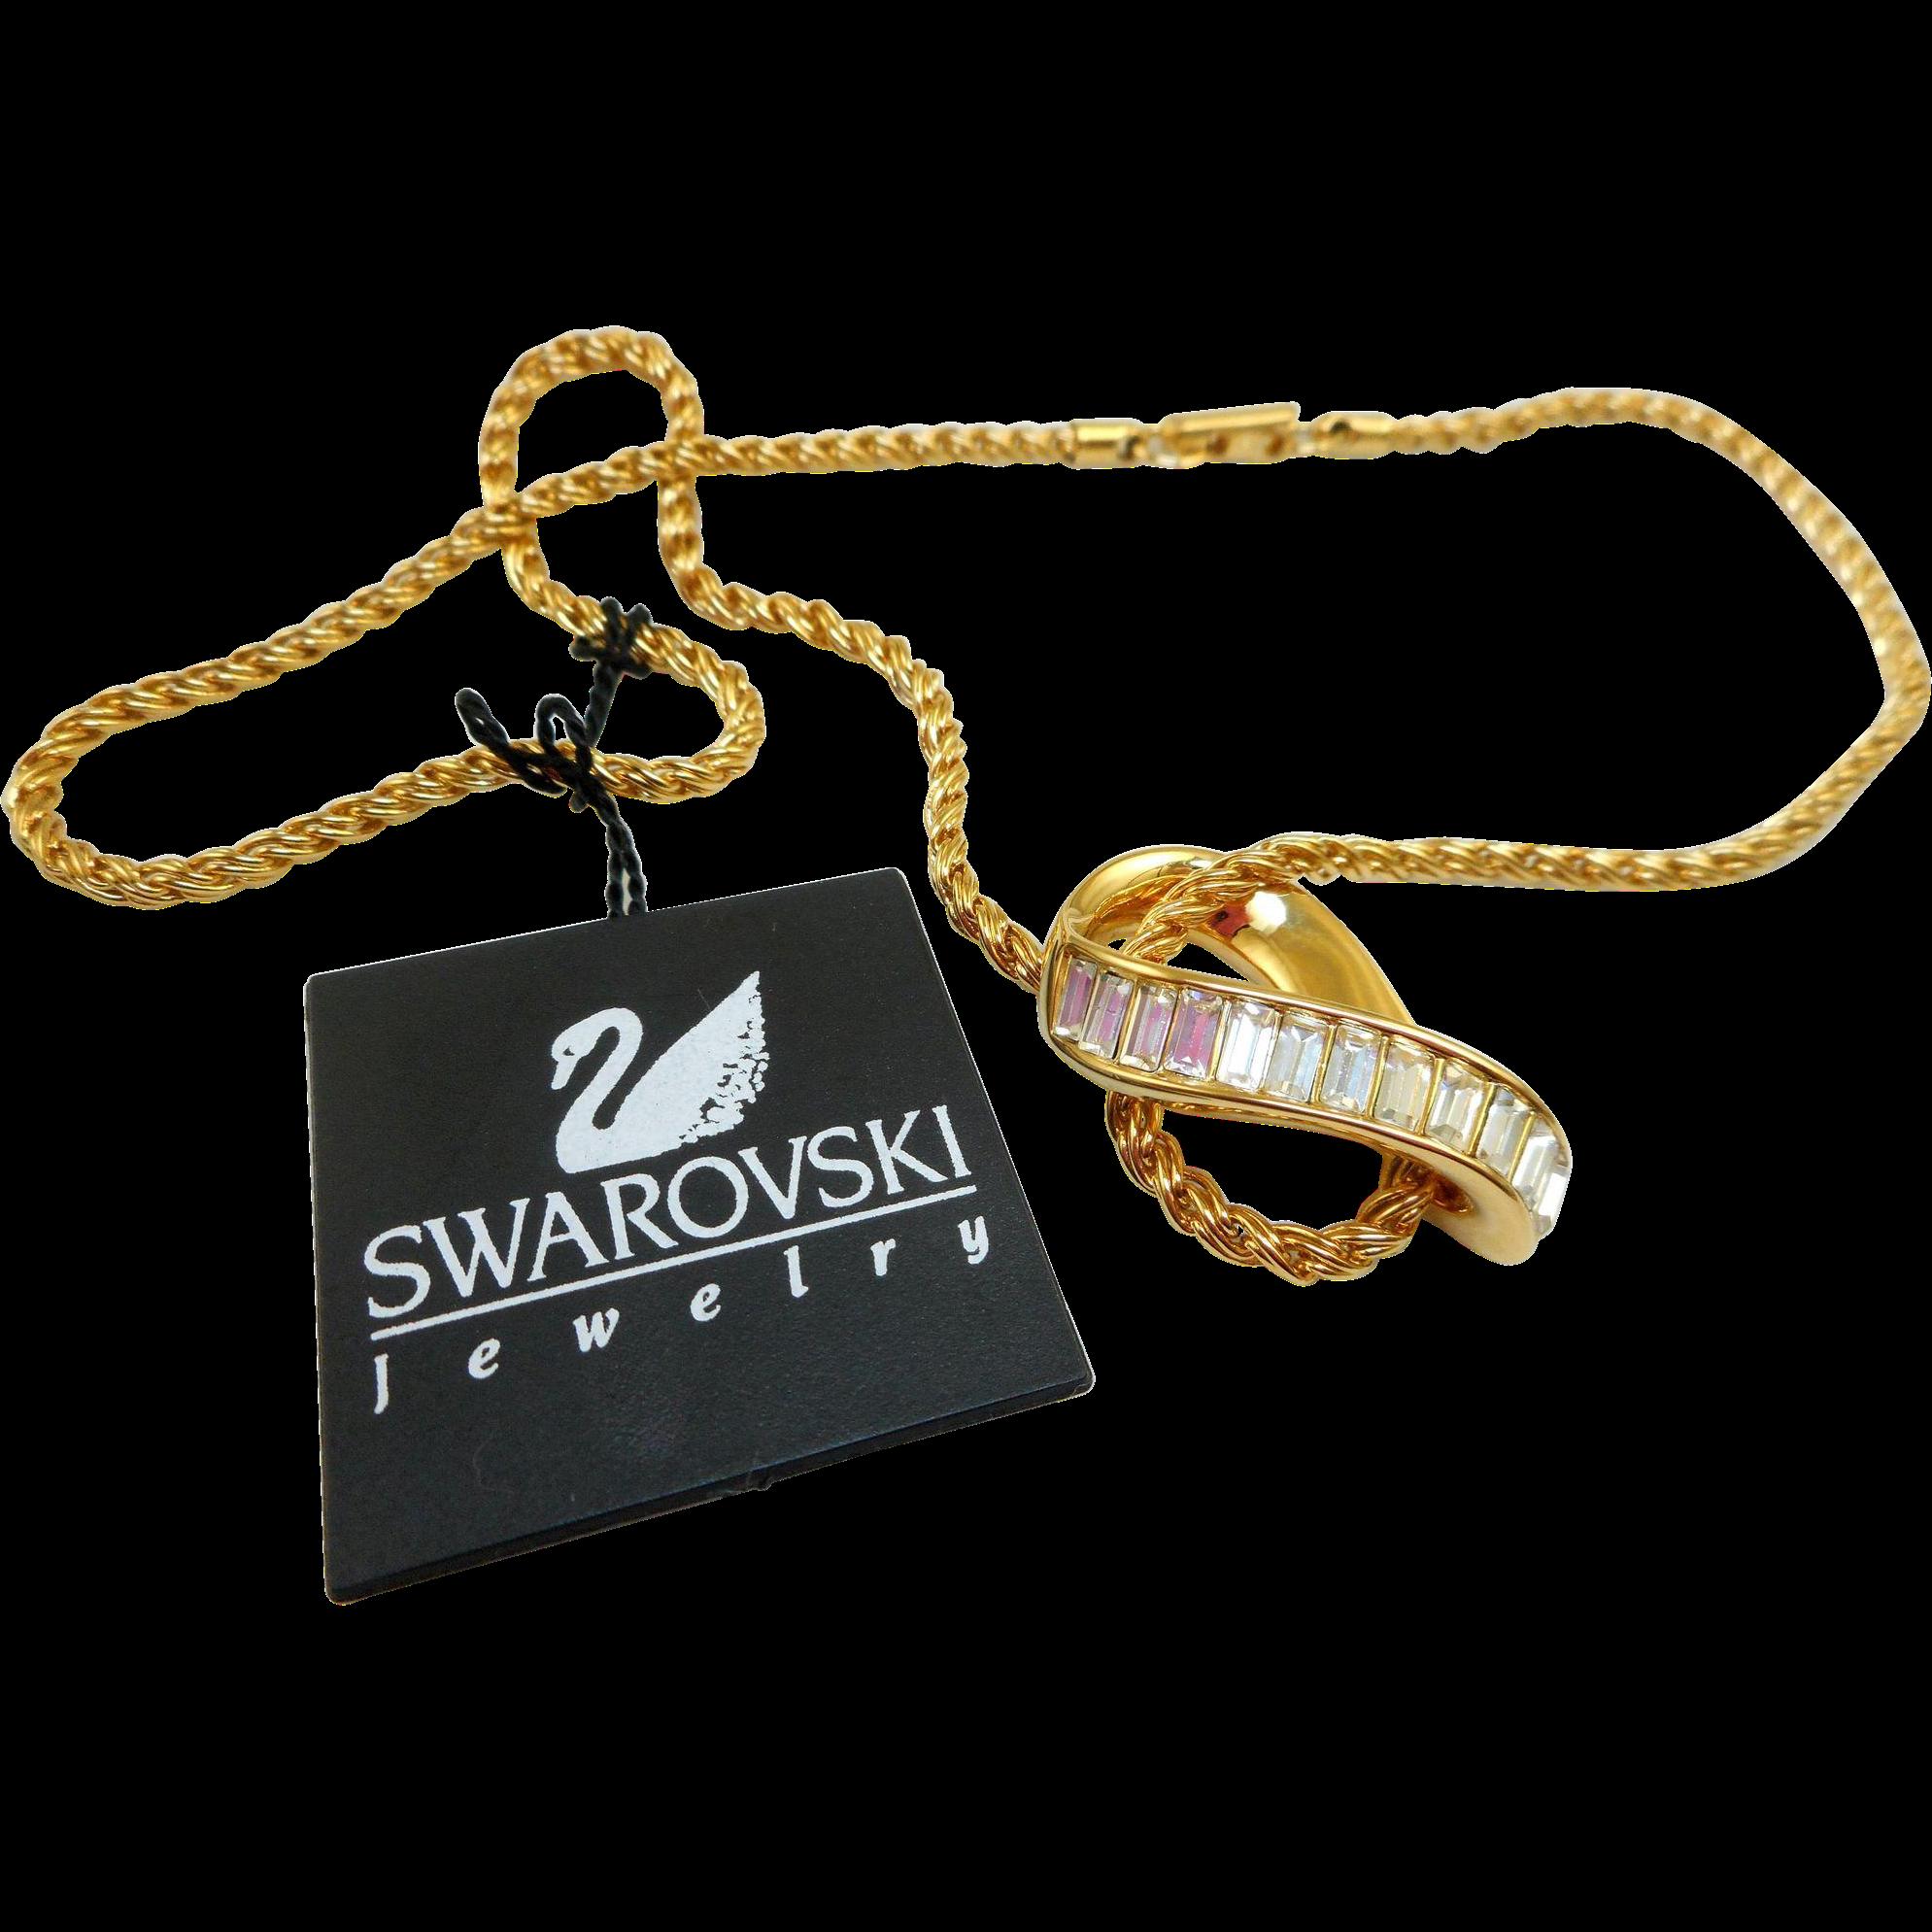 NOS Swarovski Baguette Rhinestone Pendant Necklace - MWT